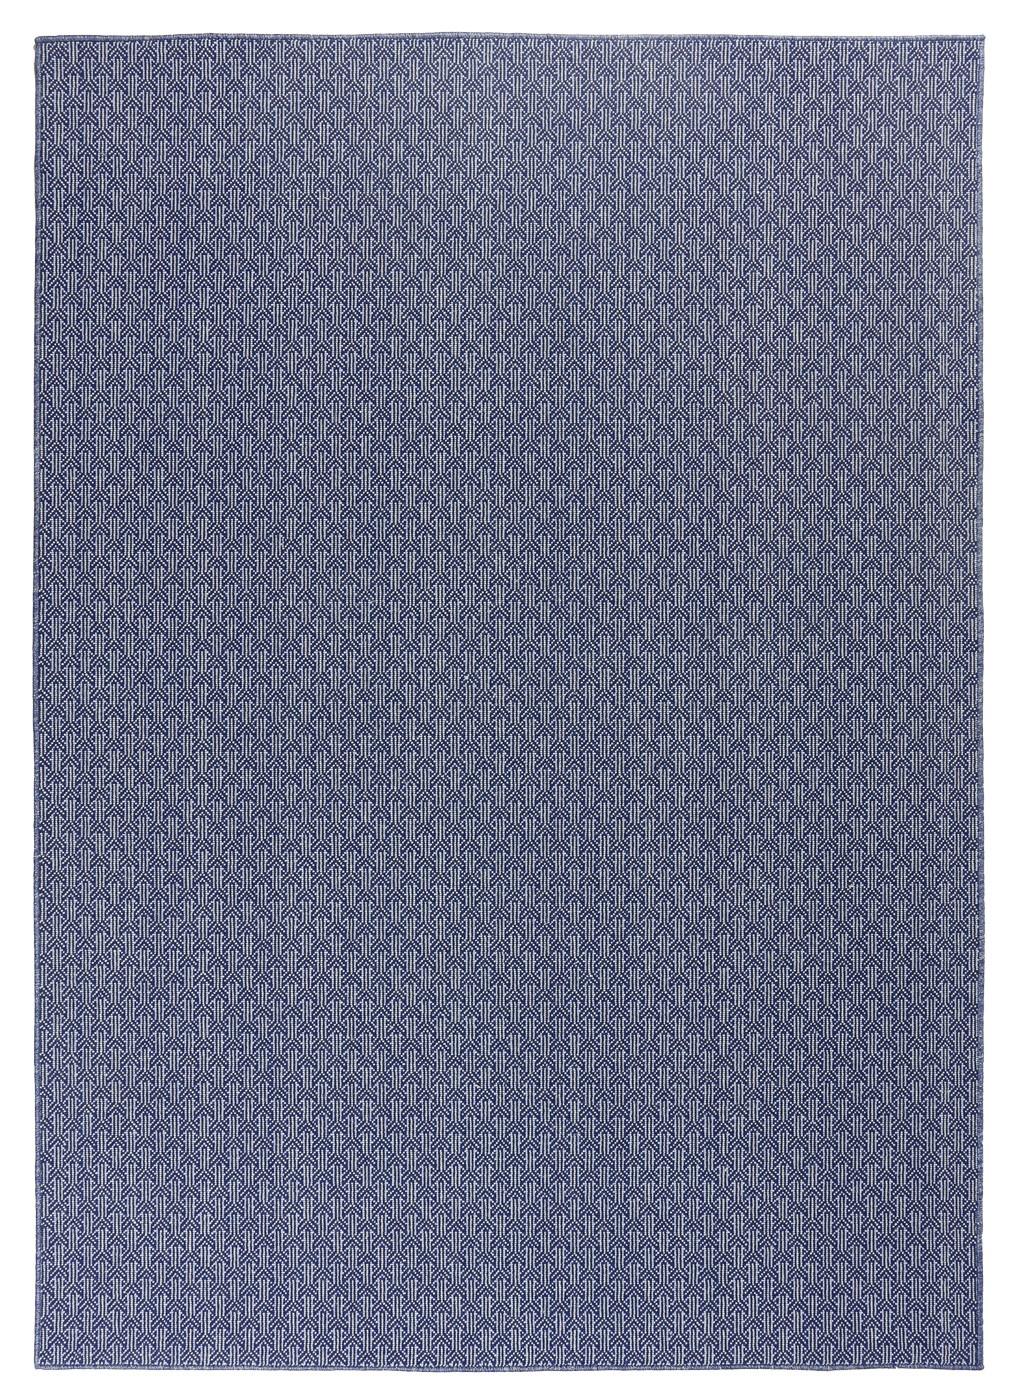 Indigo Azul. Alfombra de lana.